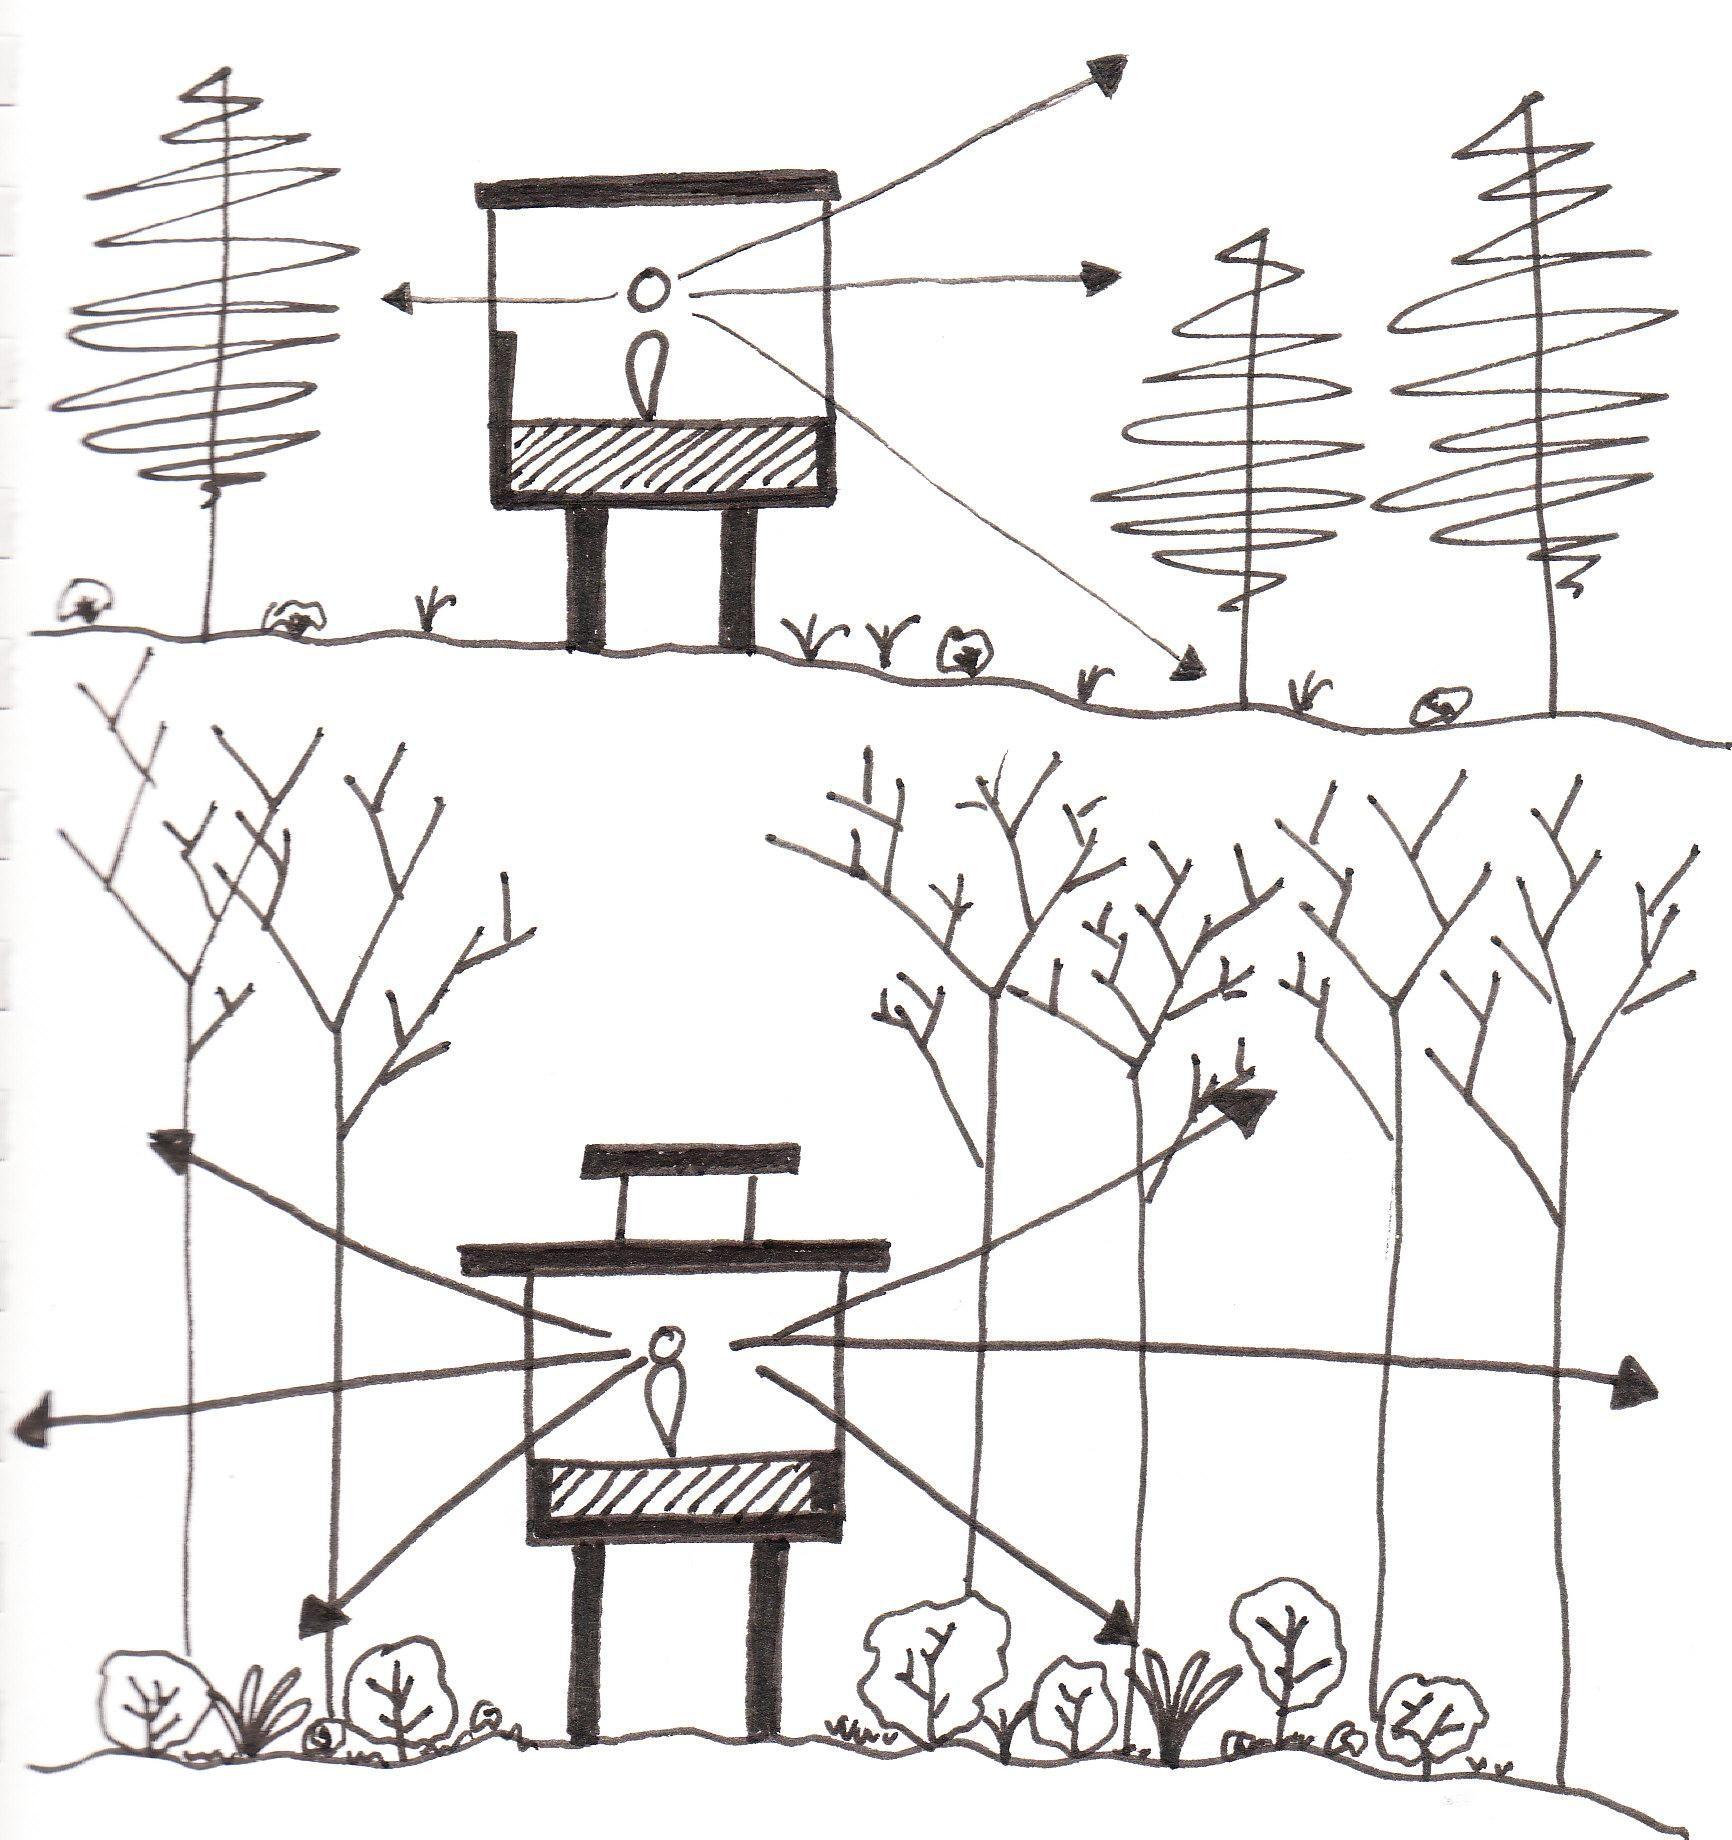 diagram sketch에 대한 이미지 검색결과 | diagram | Pinterest ...